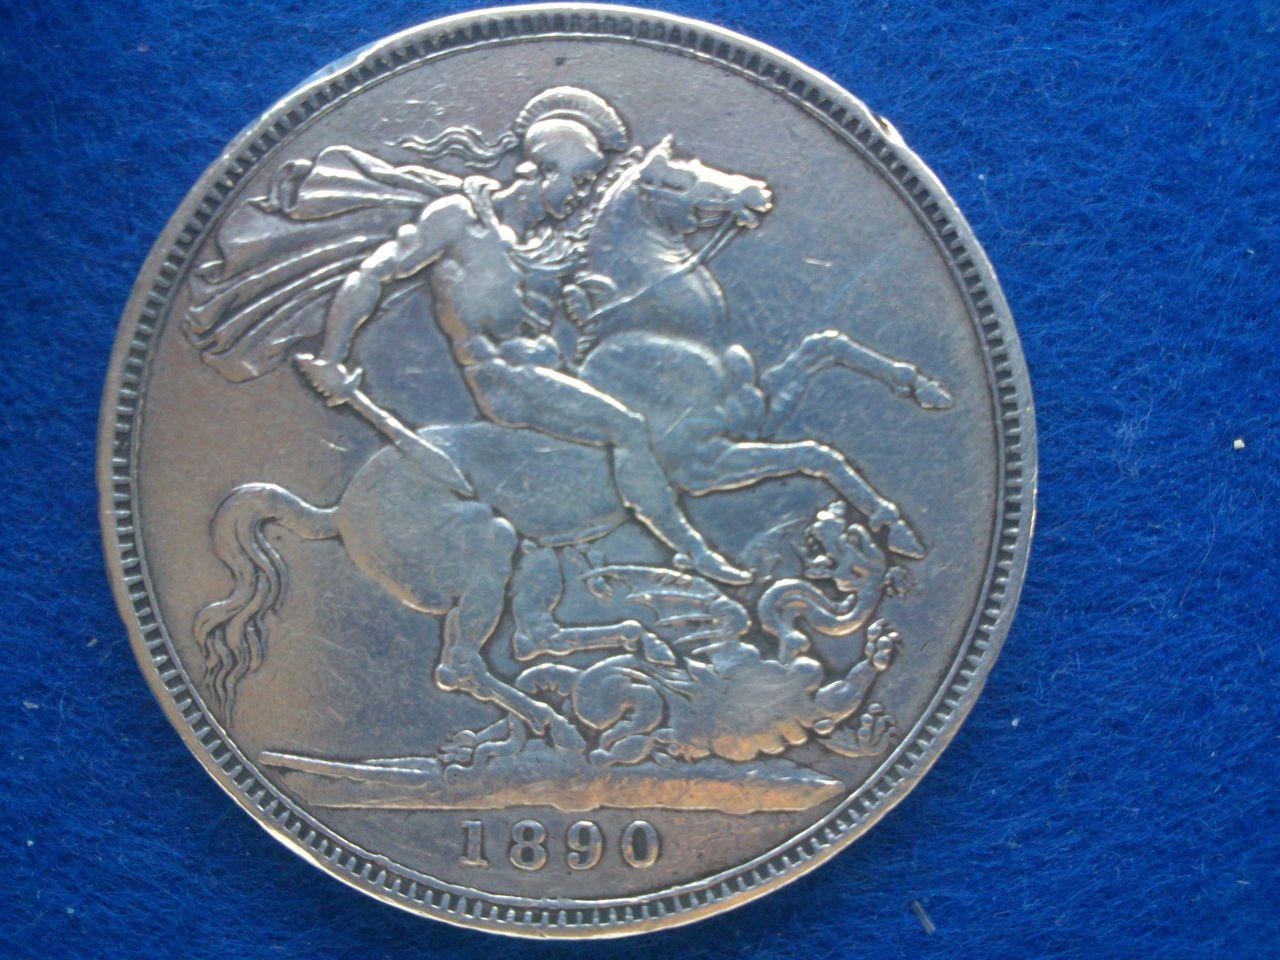 1 corona Reina Victoria 1890 Gran Bretaña 1_corona_1890_reina_Victoria